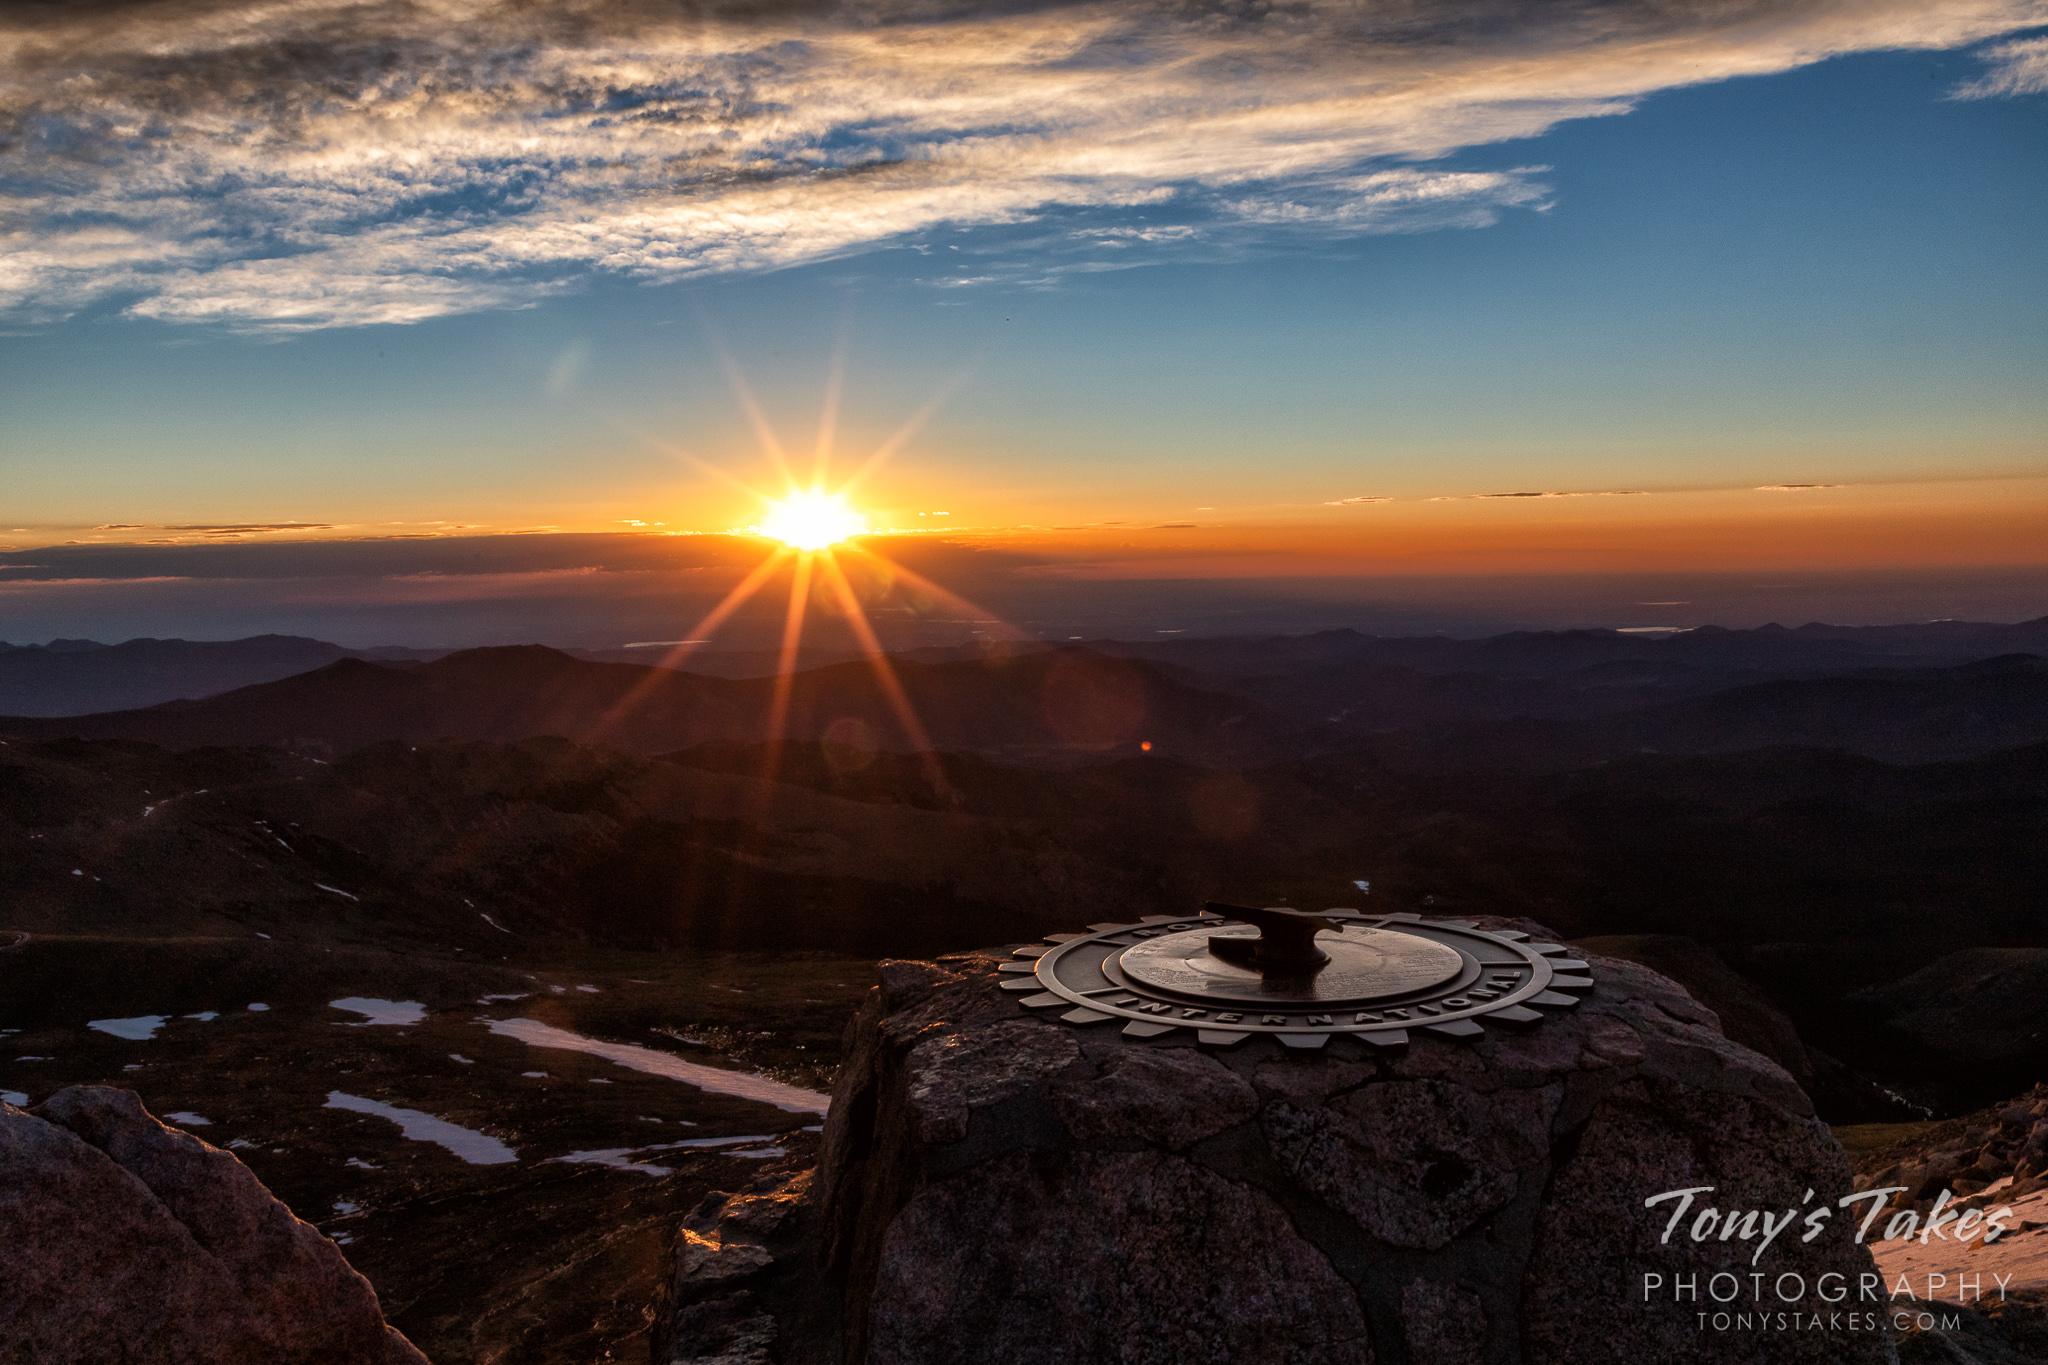 Sunrise and a sundial at 14,000 feet